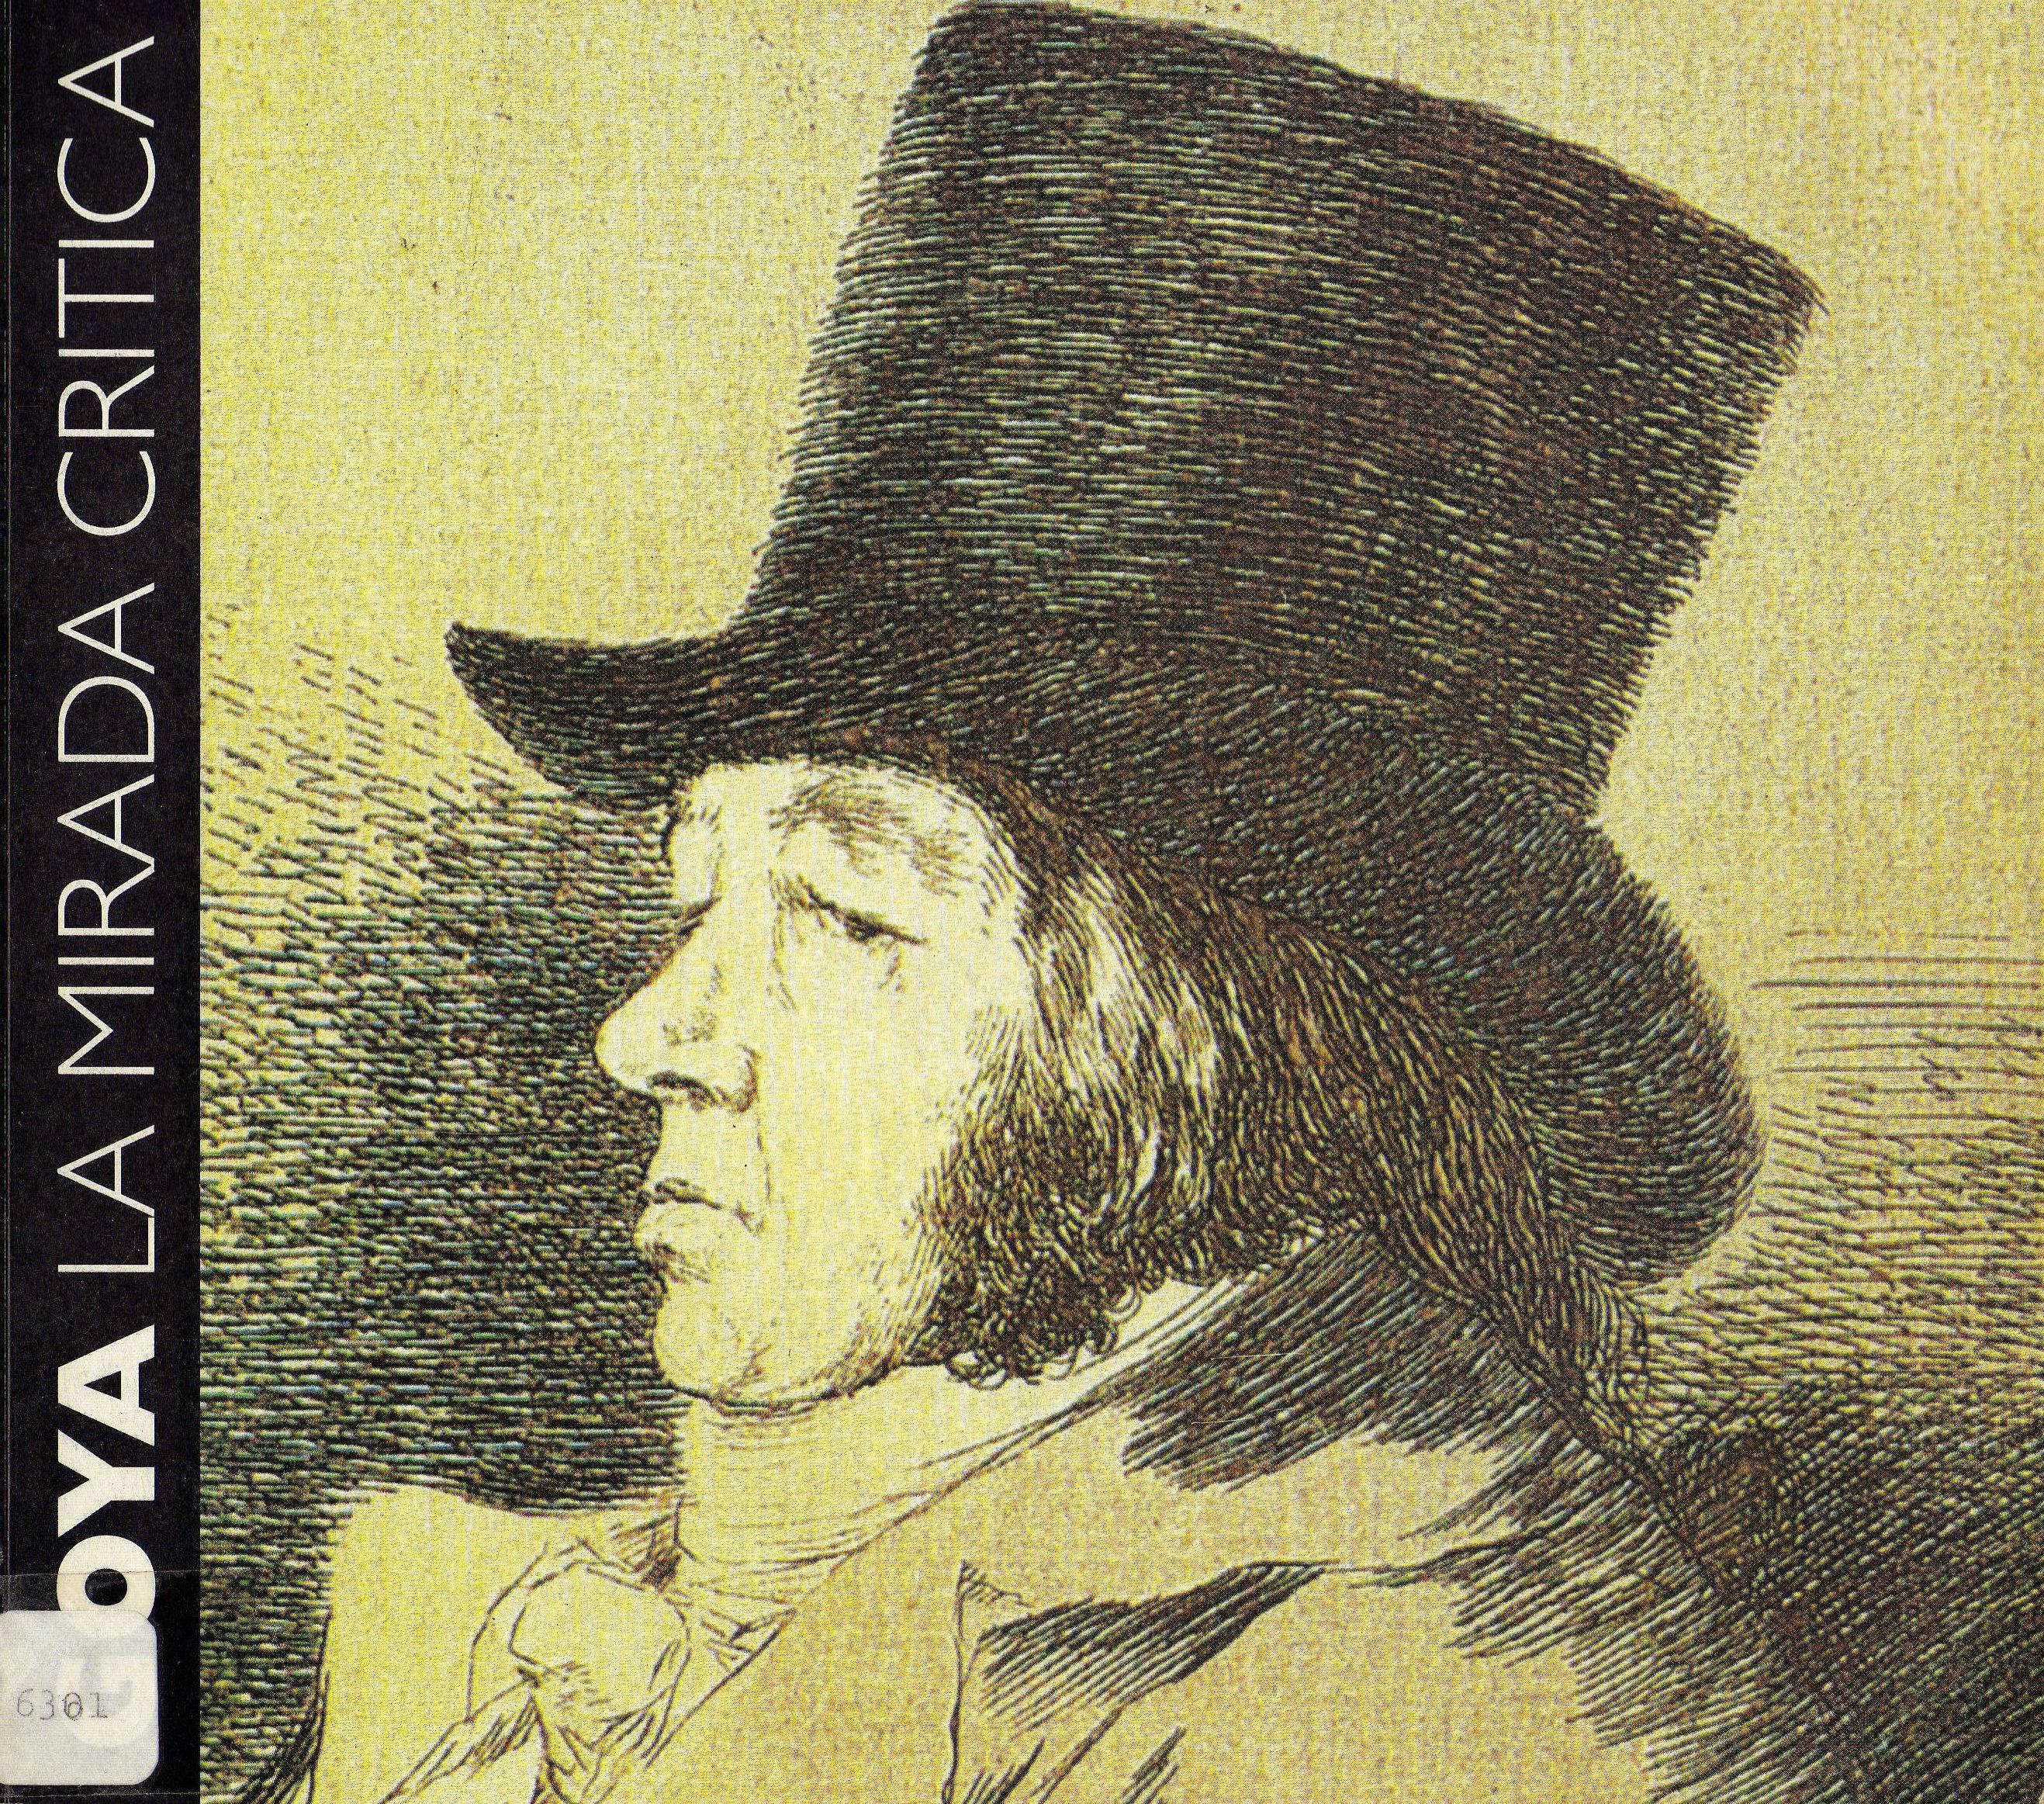 Goya la mirada crítica